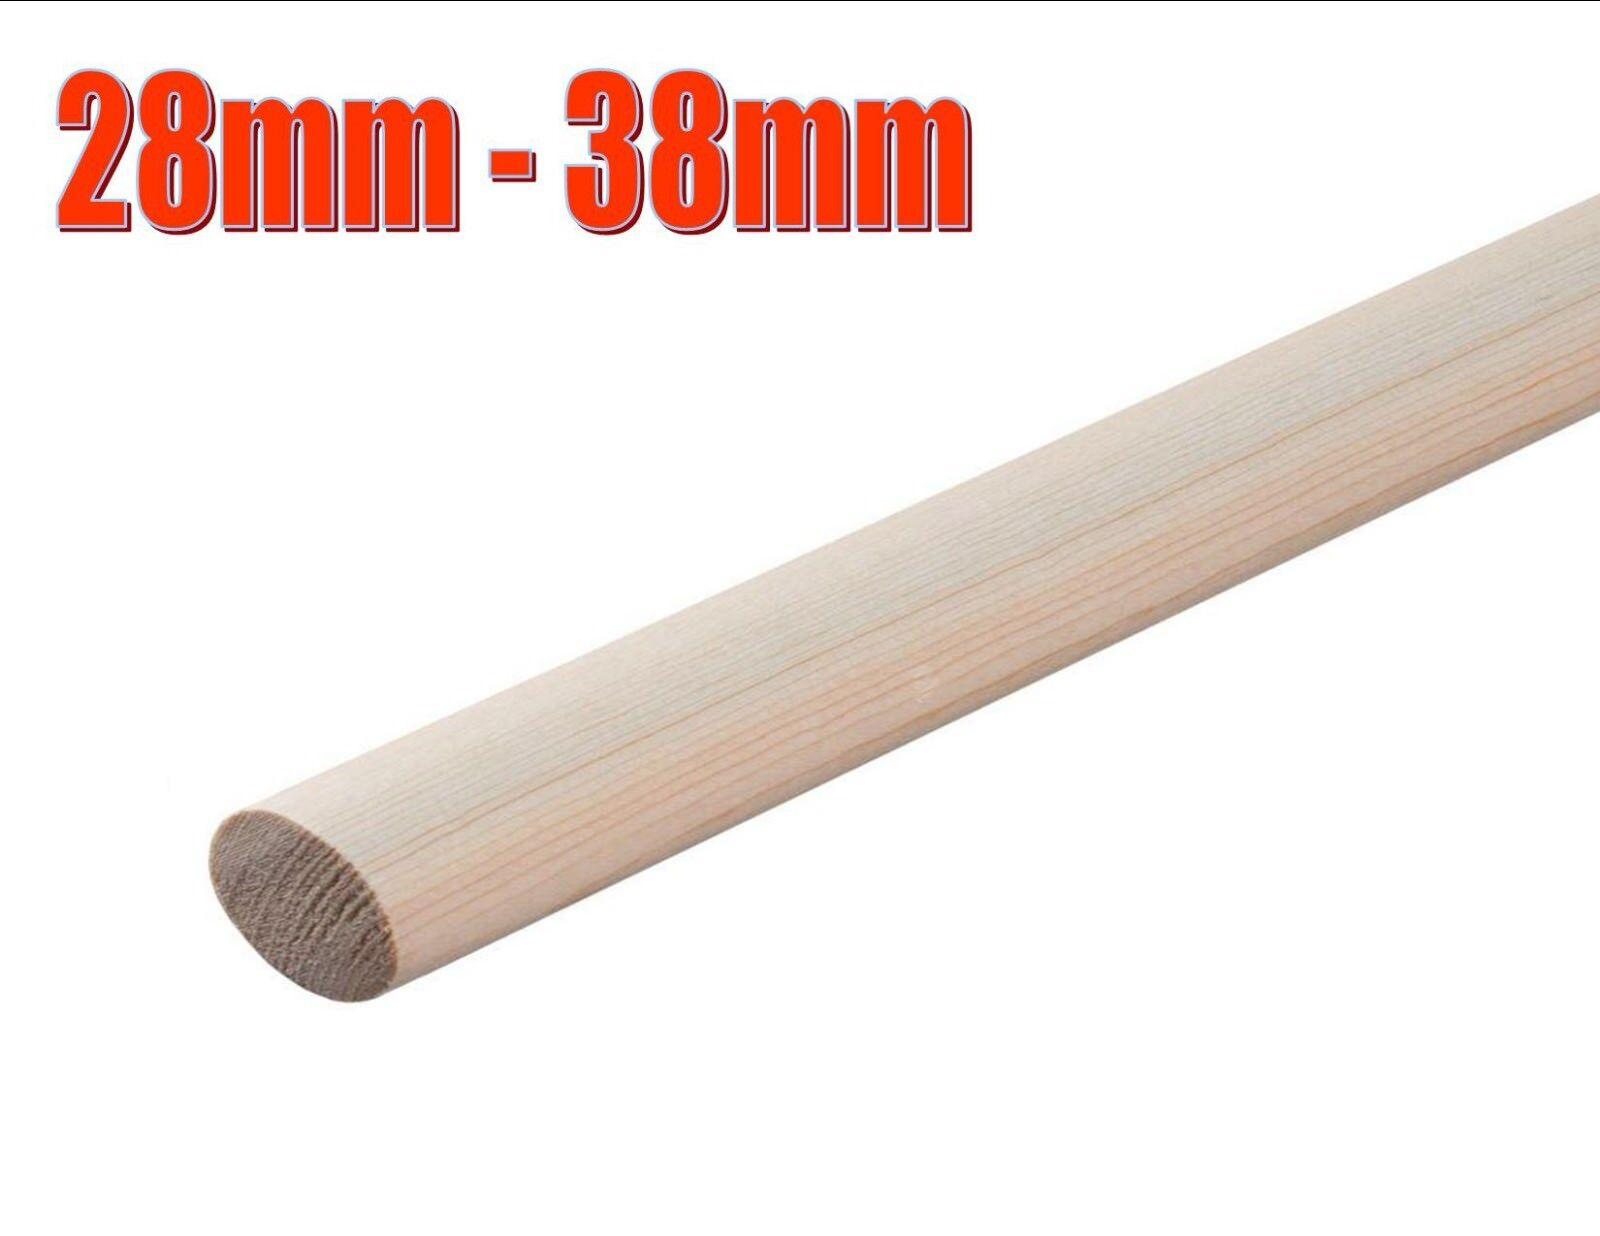 Wooden Hardwood Dowels clothes rail handrail broom handle 28mm 31mm 34mm 38mm